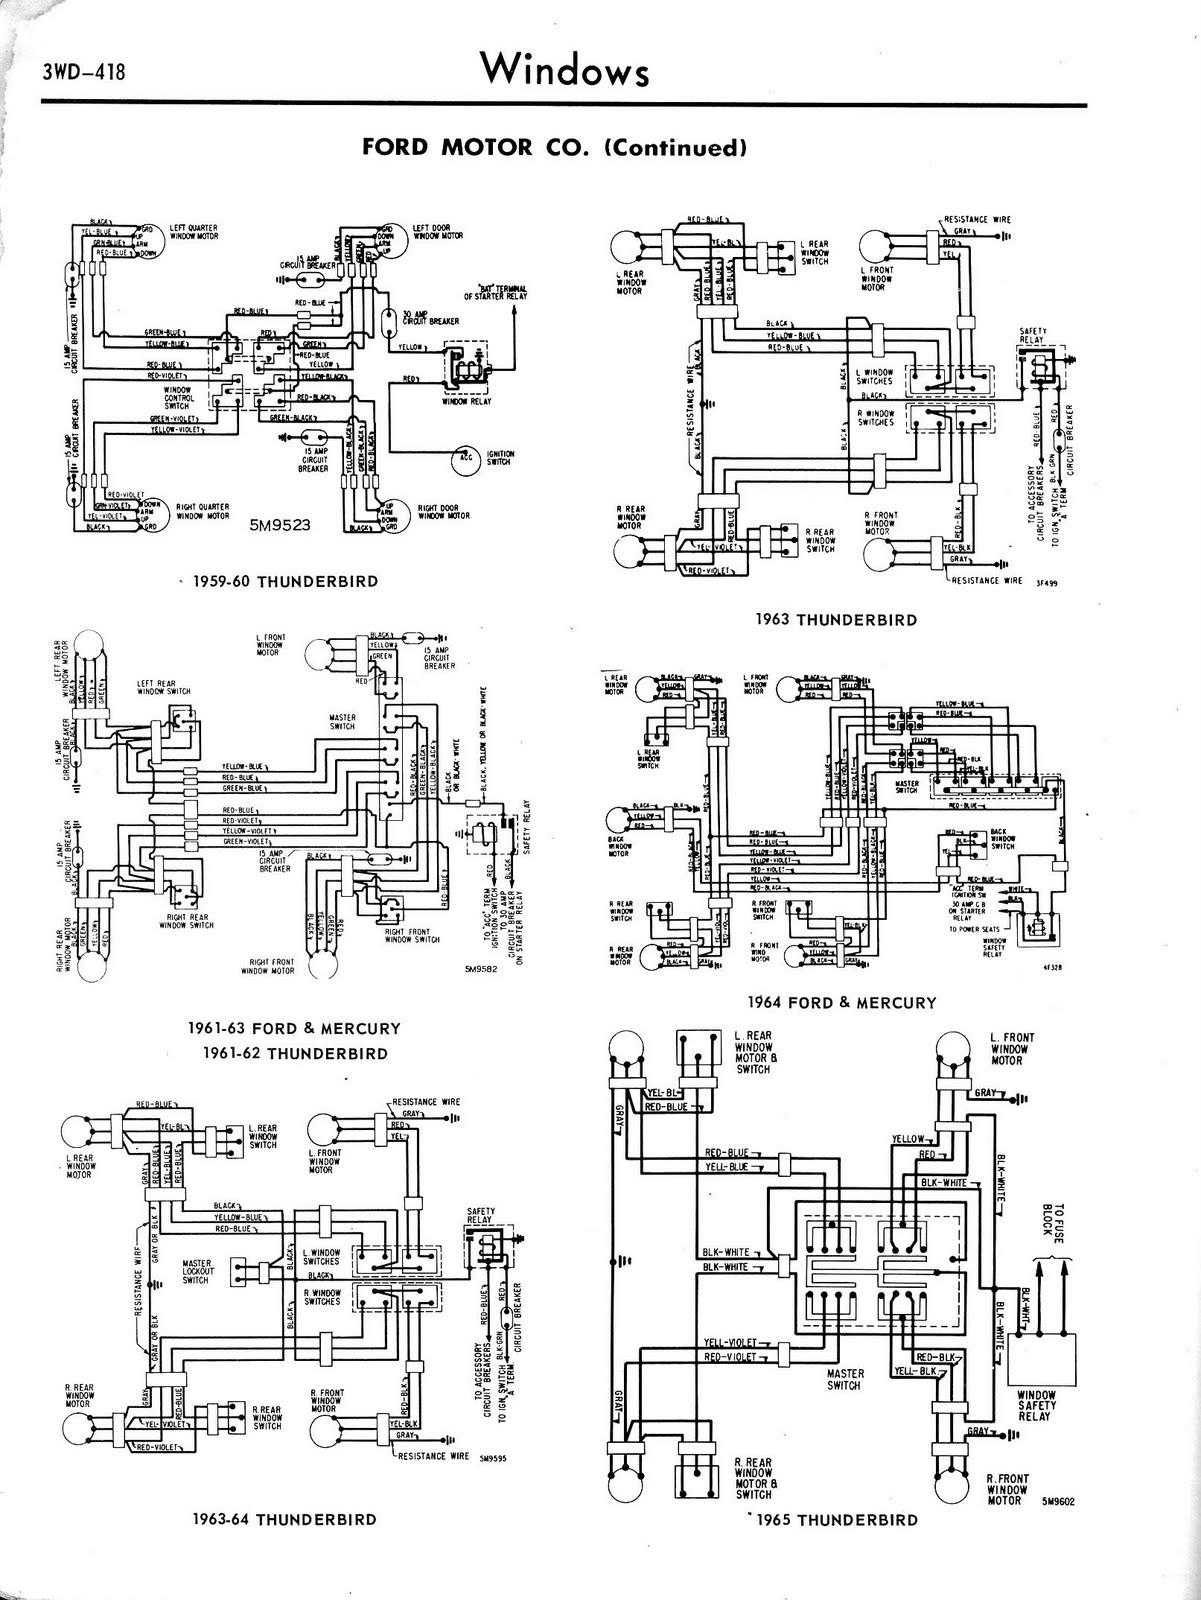 [SCHEMATICS_4JK]  FF_1823] 1964 Ford Thunderbird Fuse Diagram Wiring Diagram   2002 Thunderbird Wiring Harness      Sianu Emba Mohammedshrine Librar Wiring 101